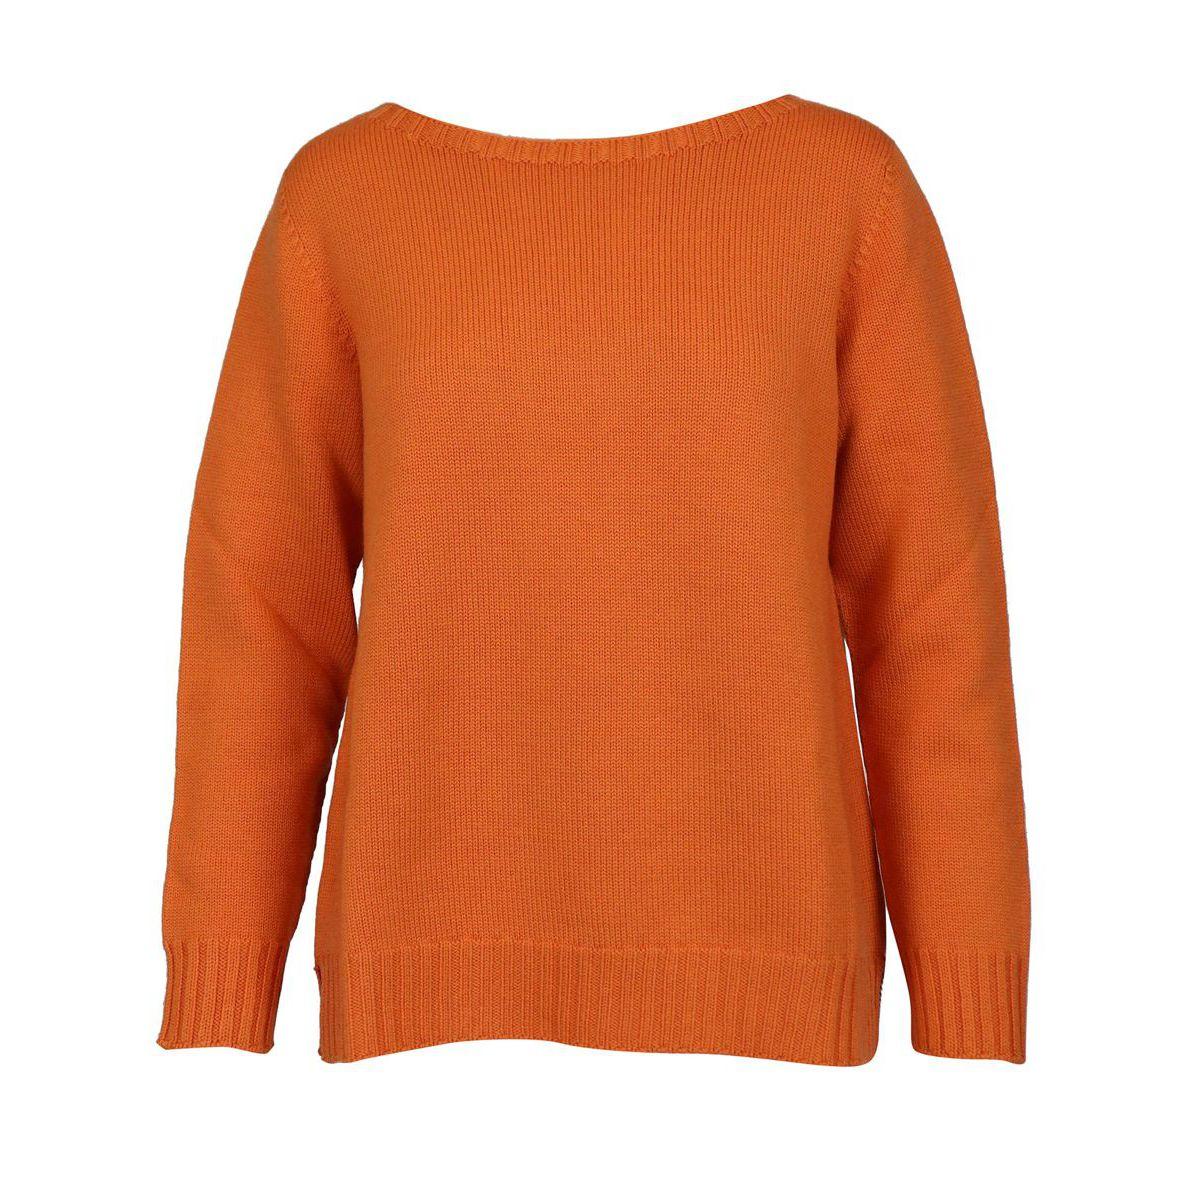 Sweater in shaved marinara virgin wool Orange Gran Sasso